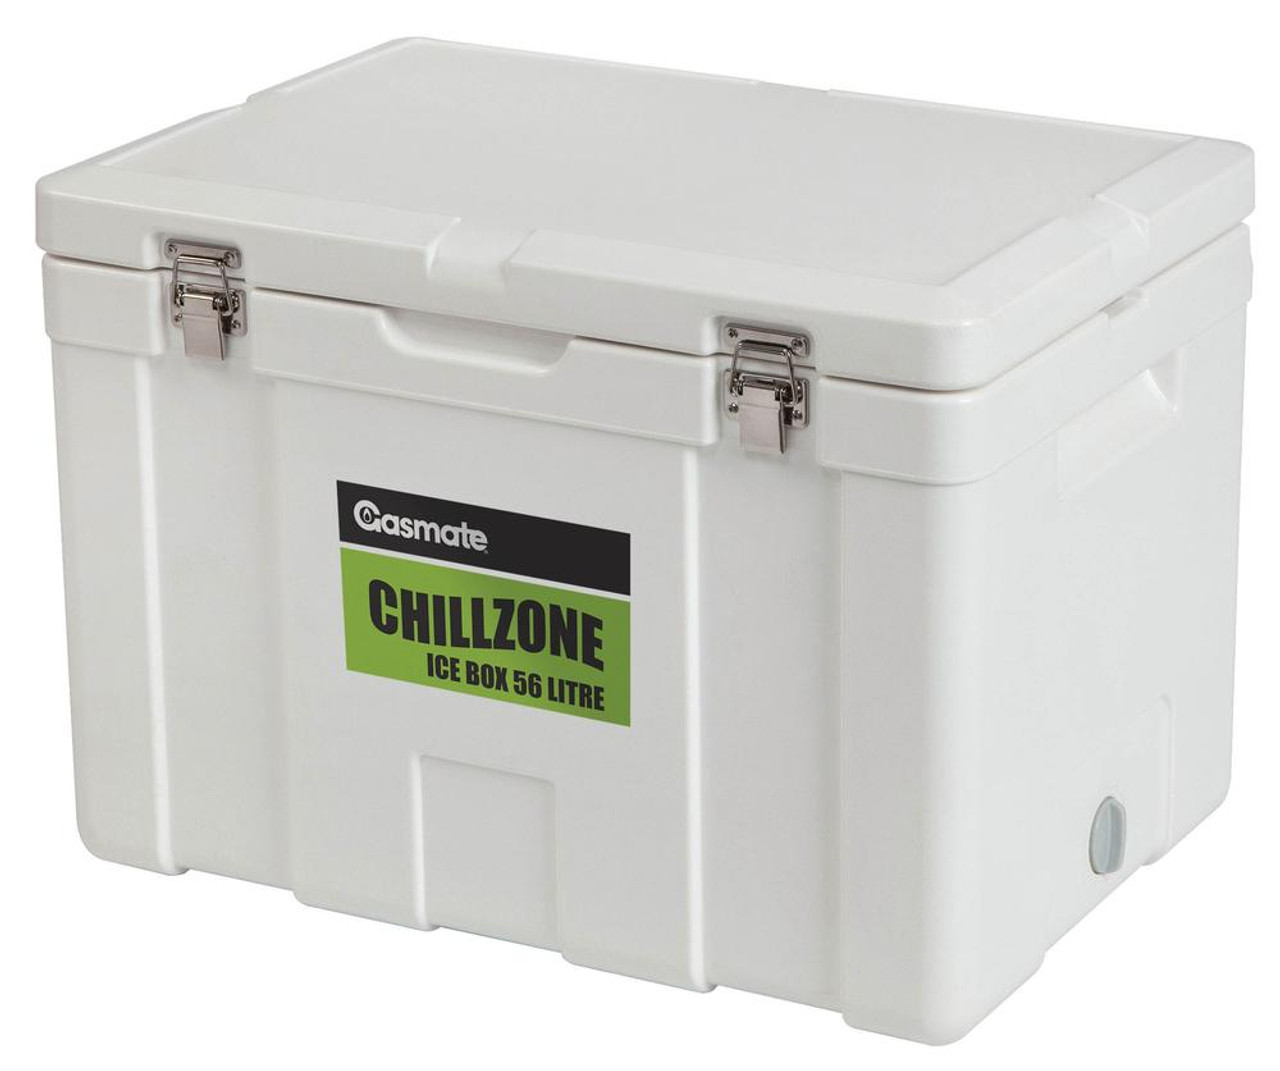 Gasmate Chillzone Ice Box 56 Litre